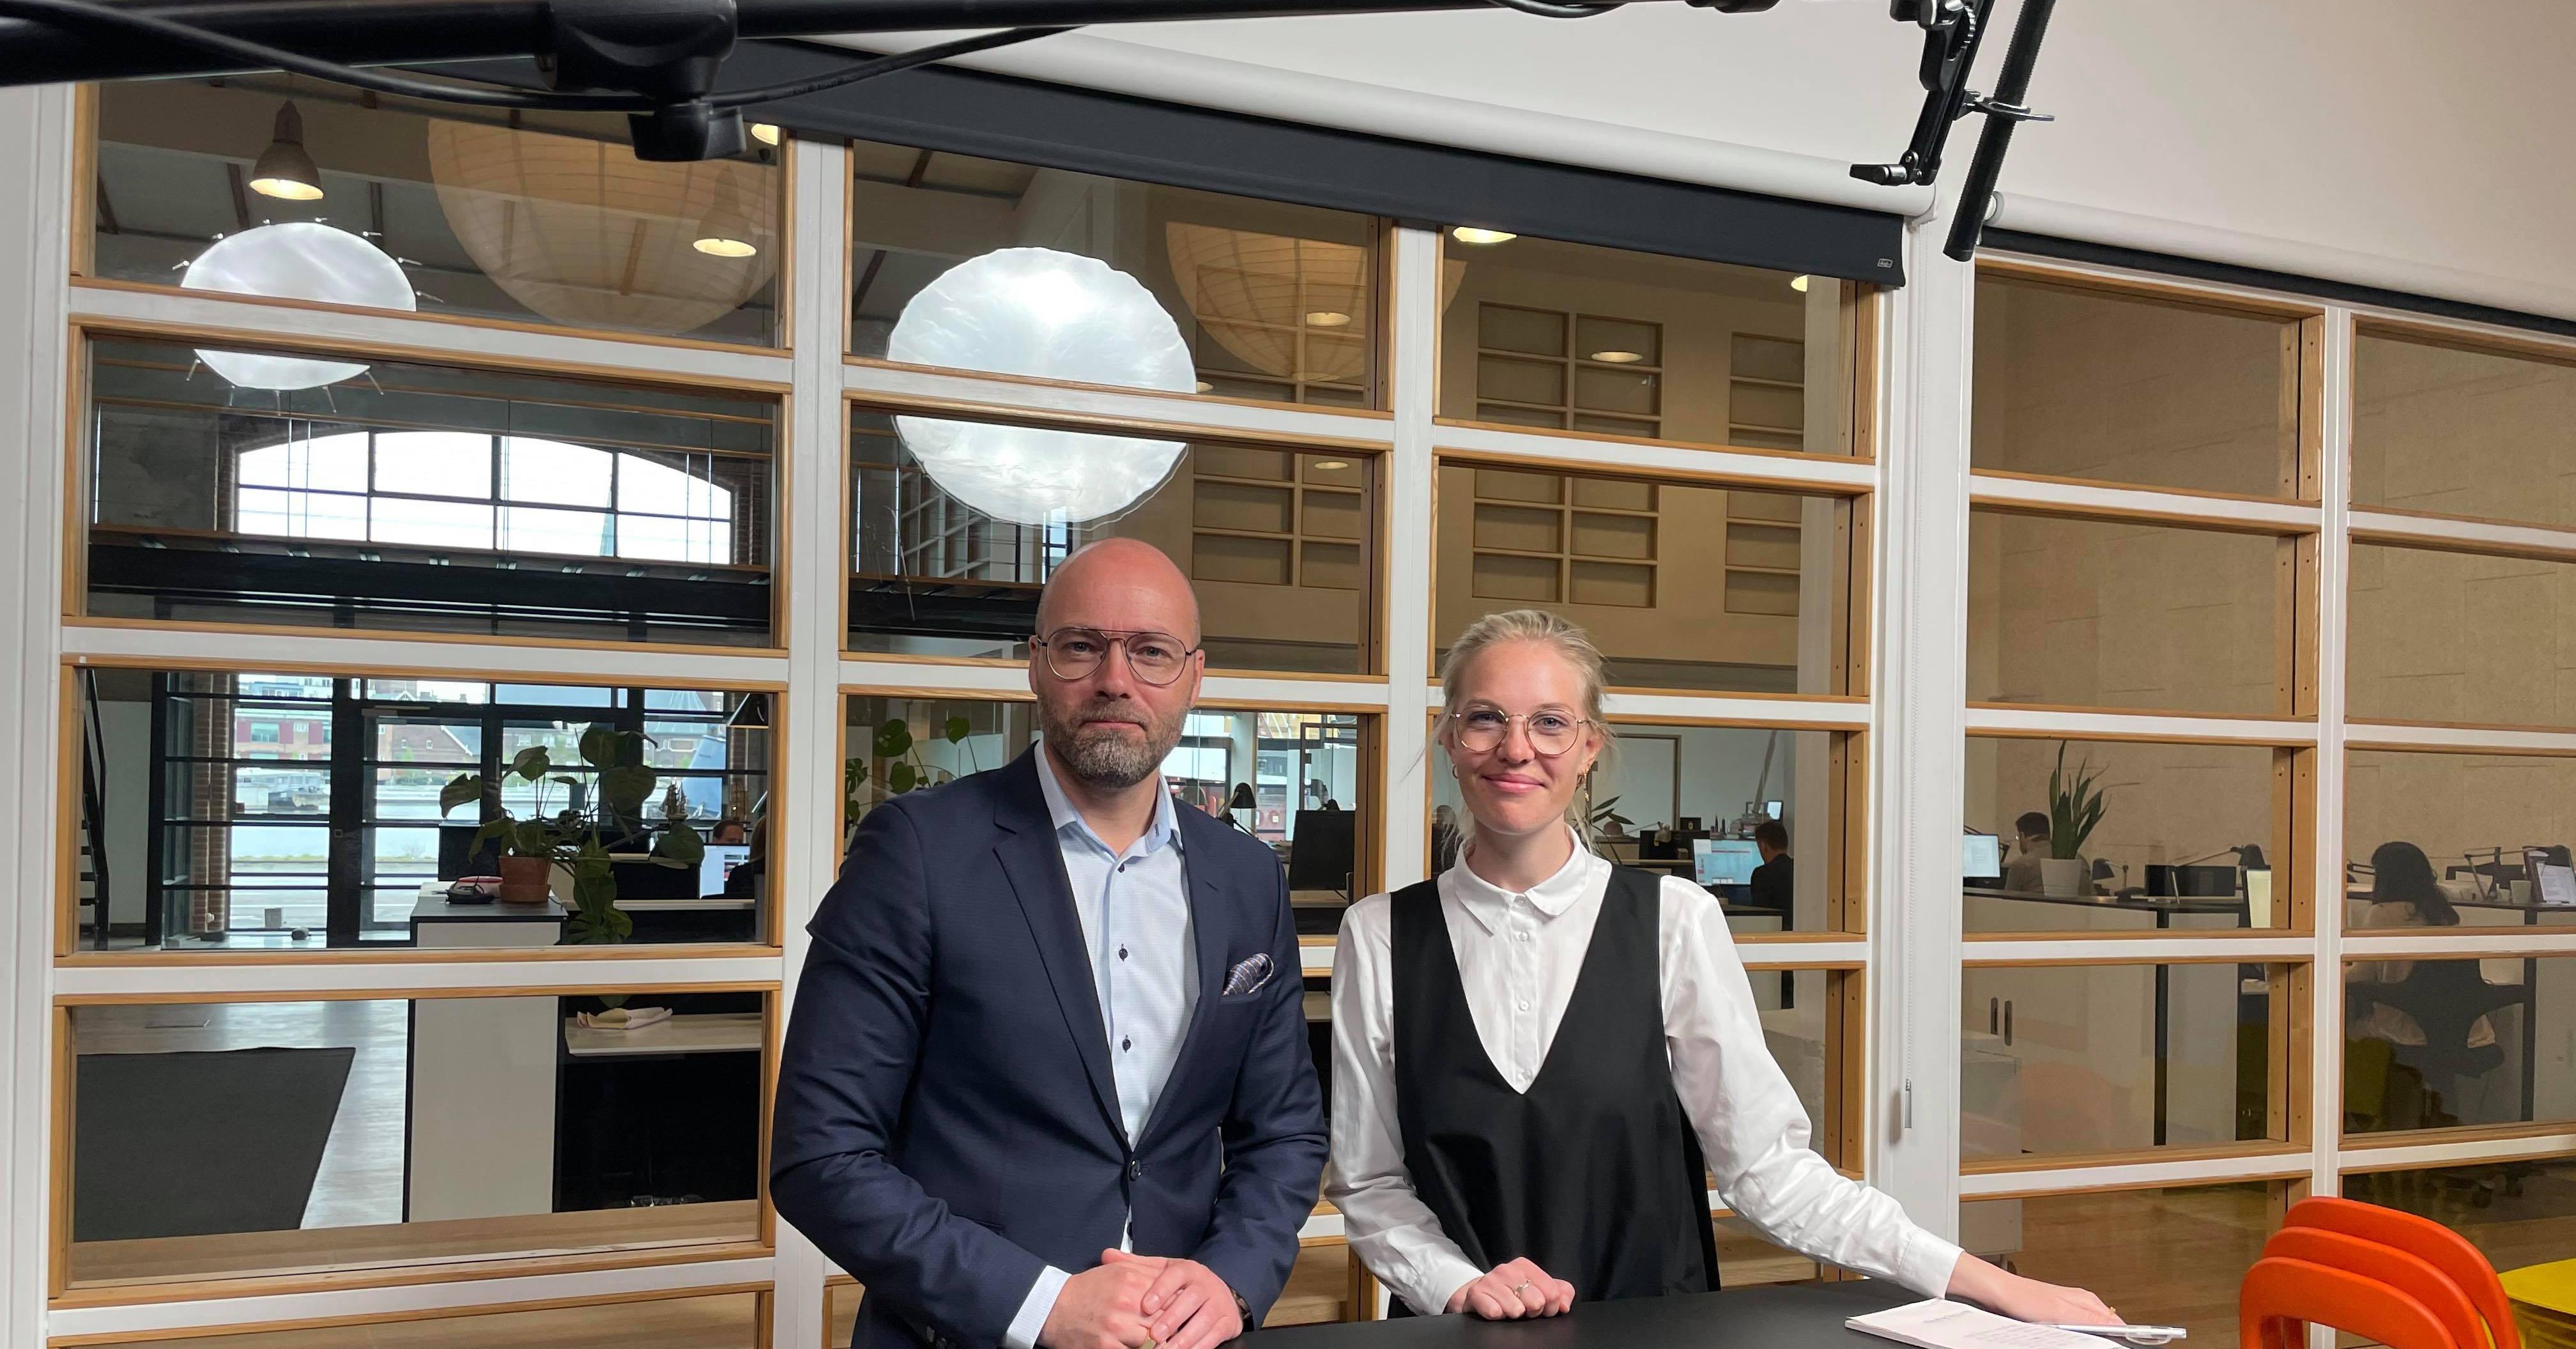 Thomas Mandrup og Signe Ahler fra Publico Kommunikation